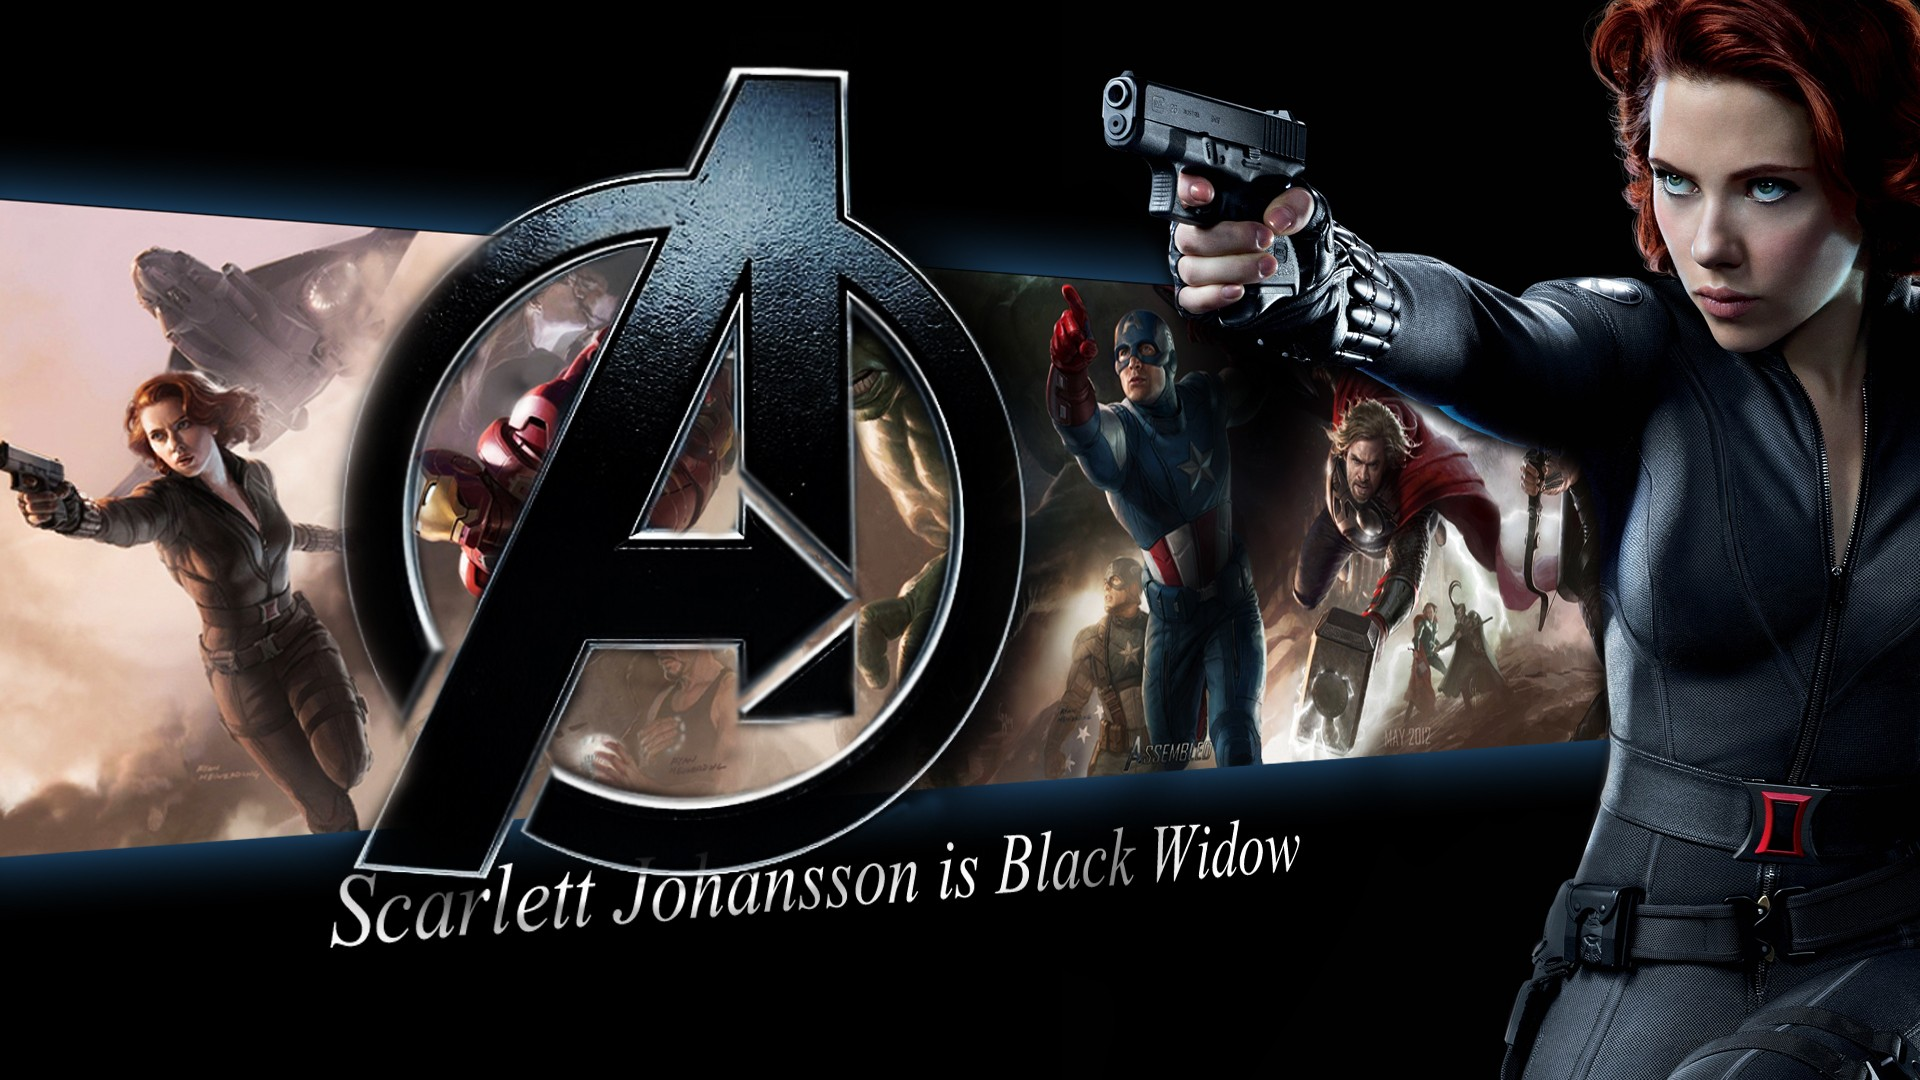 Picture The Avengers 2012 Film Scarlett Johansson Movies